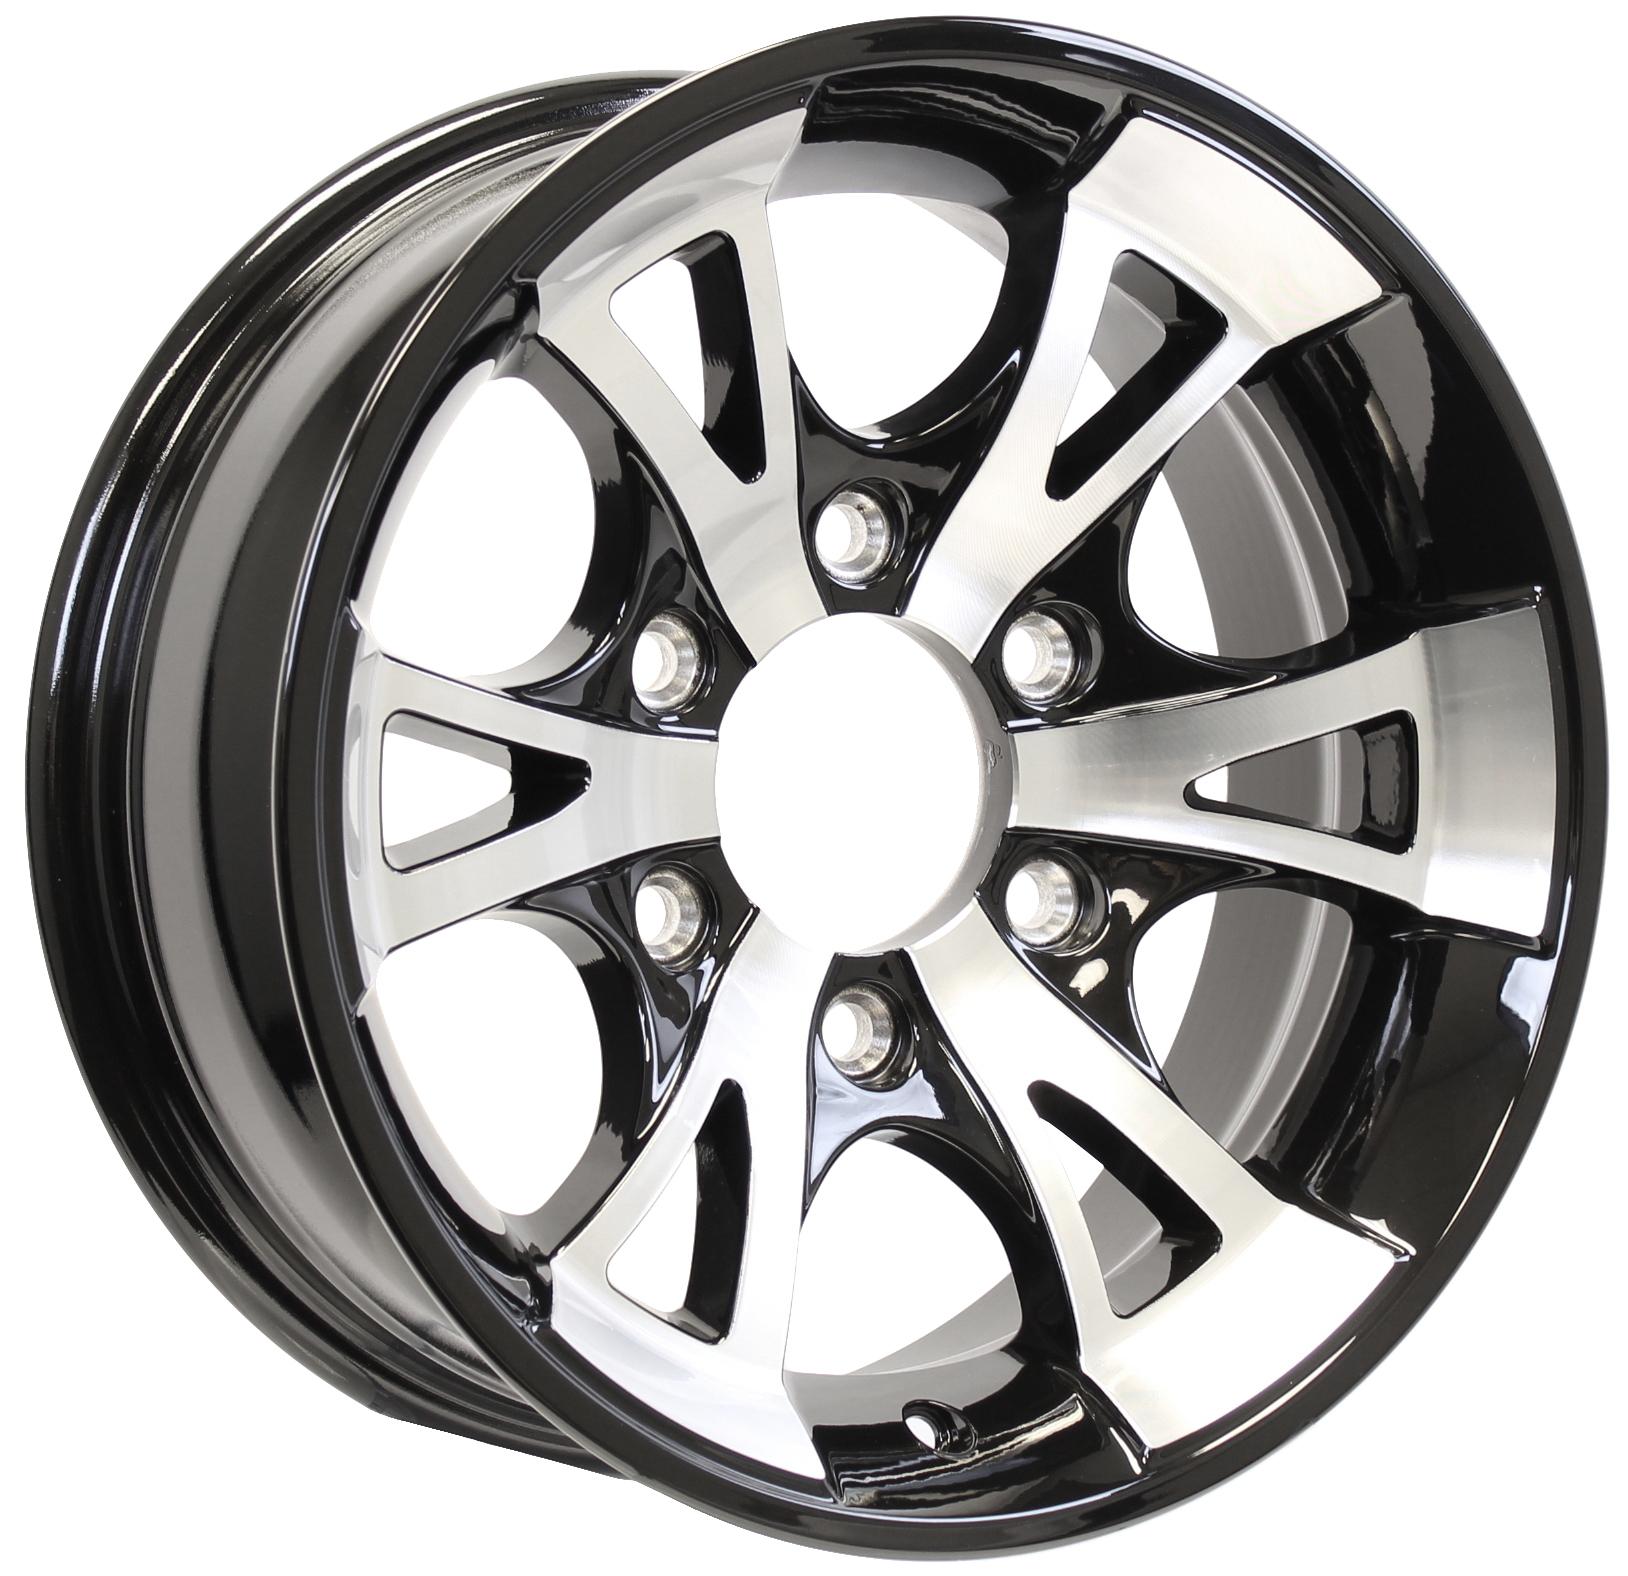 A1411- 15x6 6-5.5 Black Aluminum Trailer Wheel Image